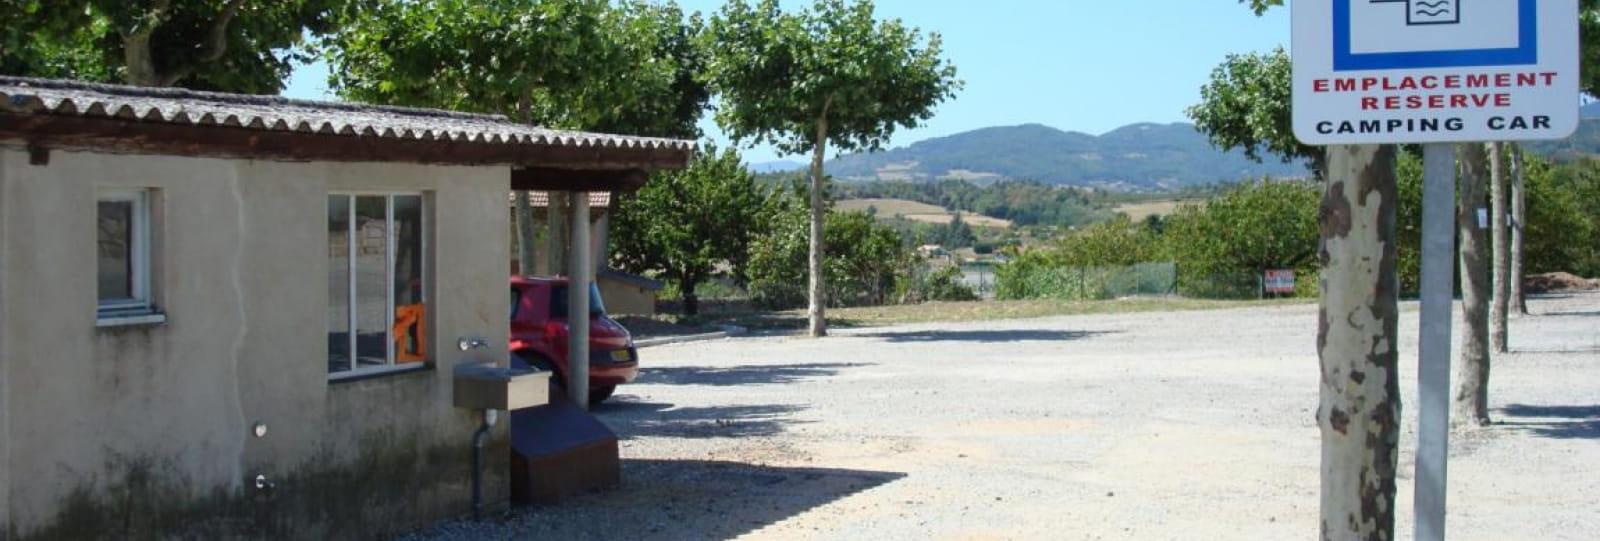 Aire de service/accueil camping-car